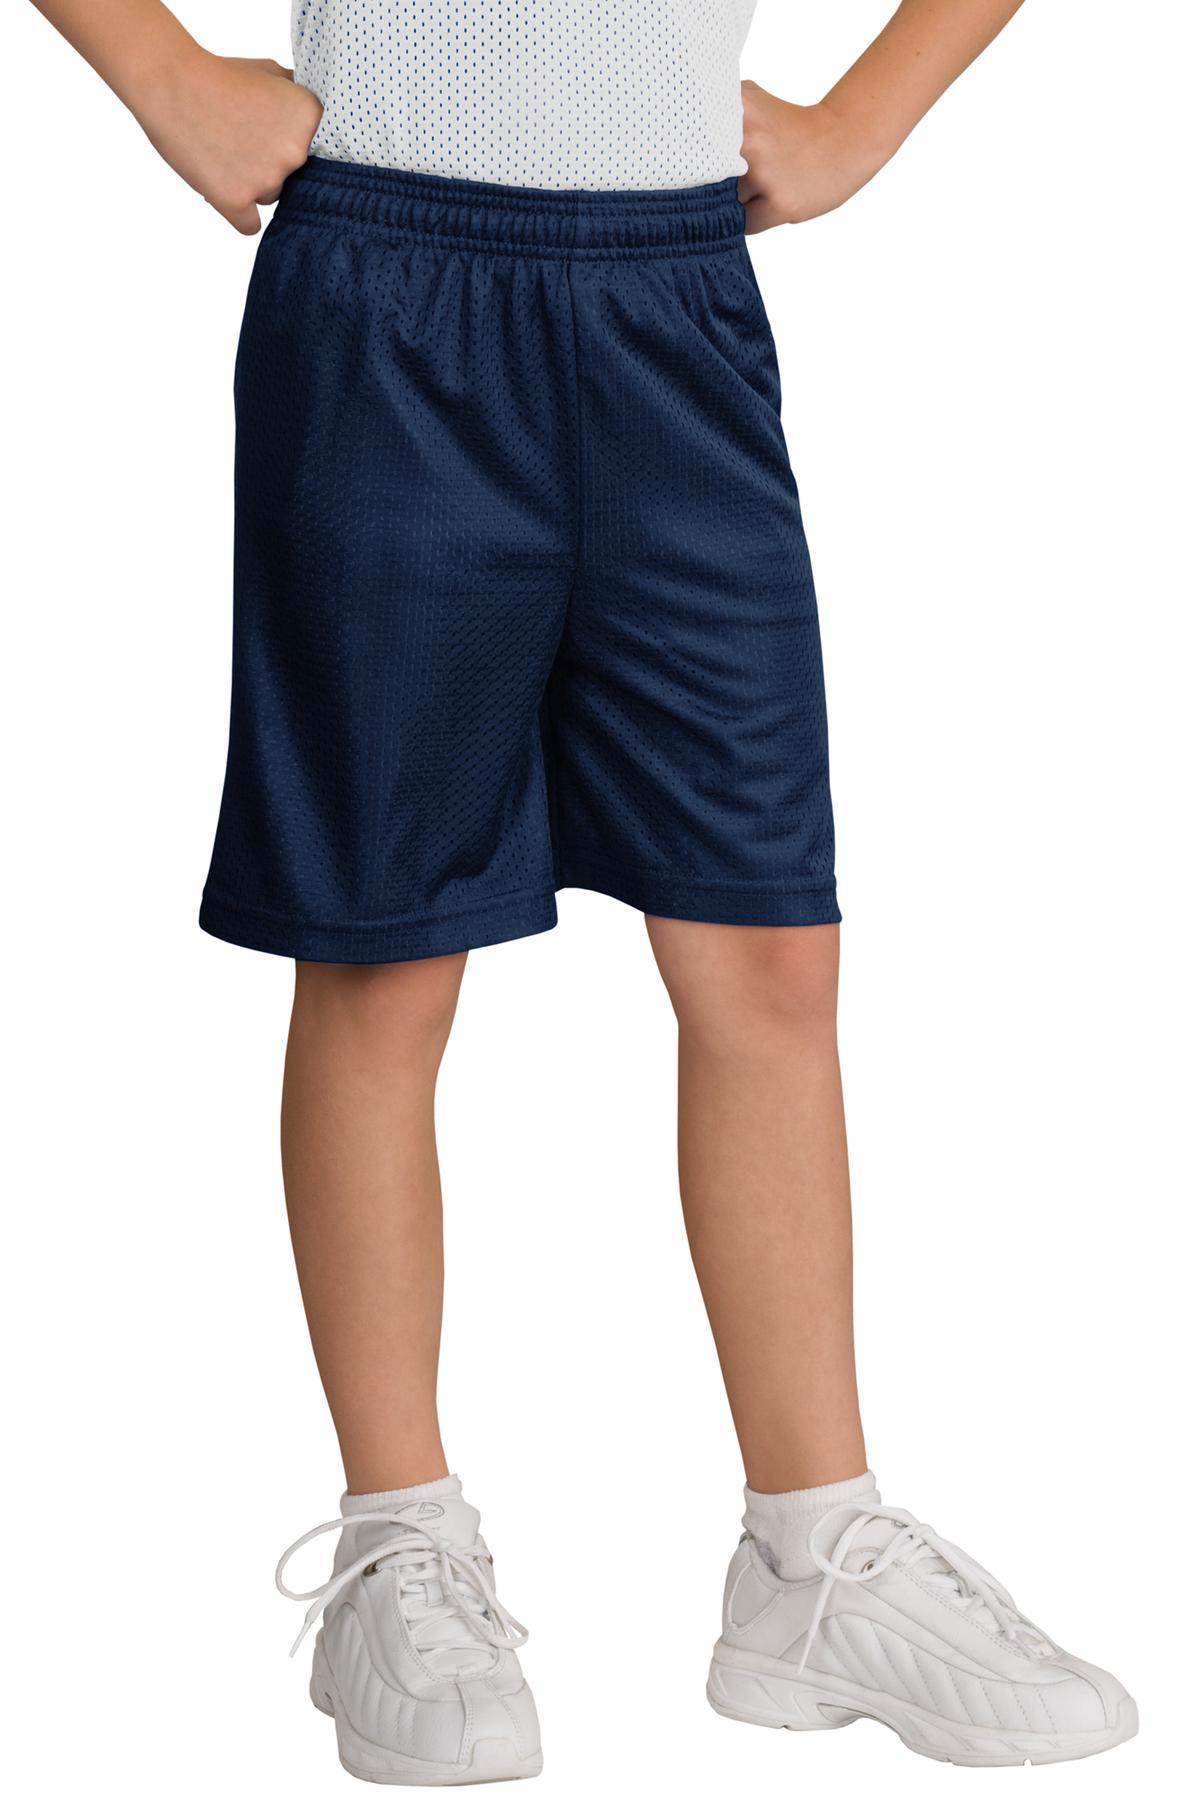 Shorts-18